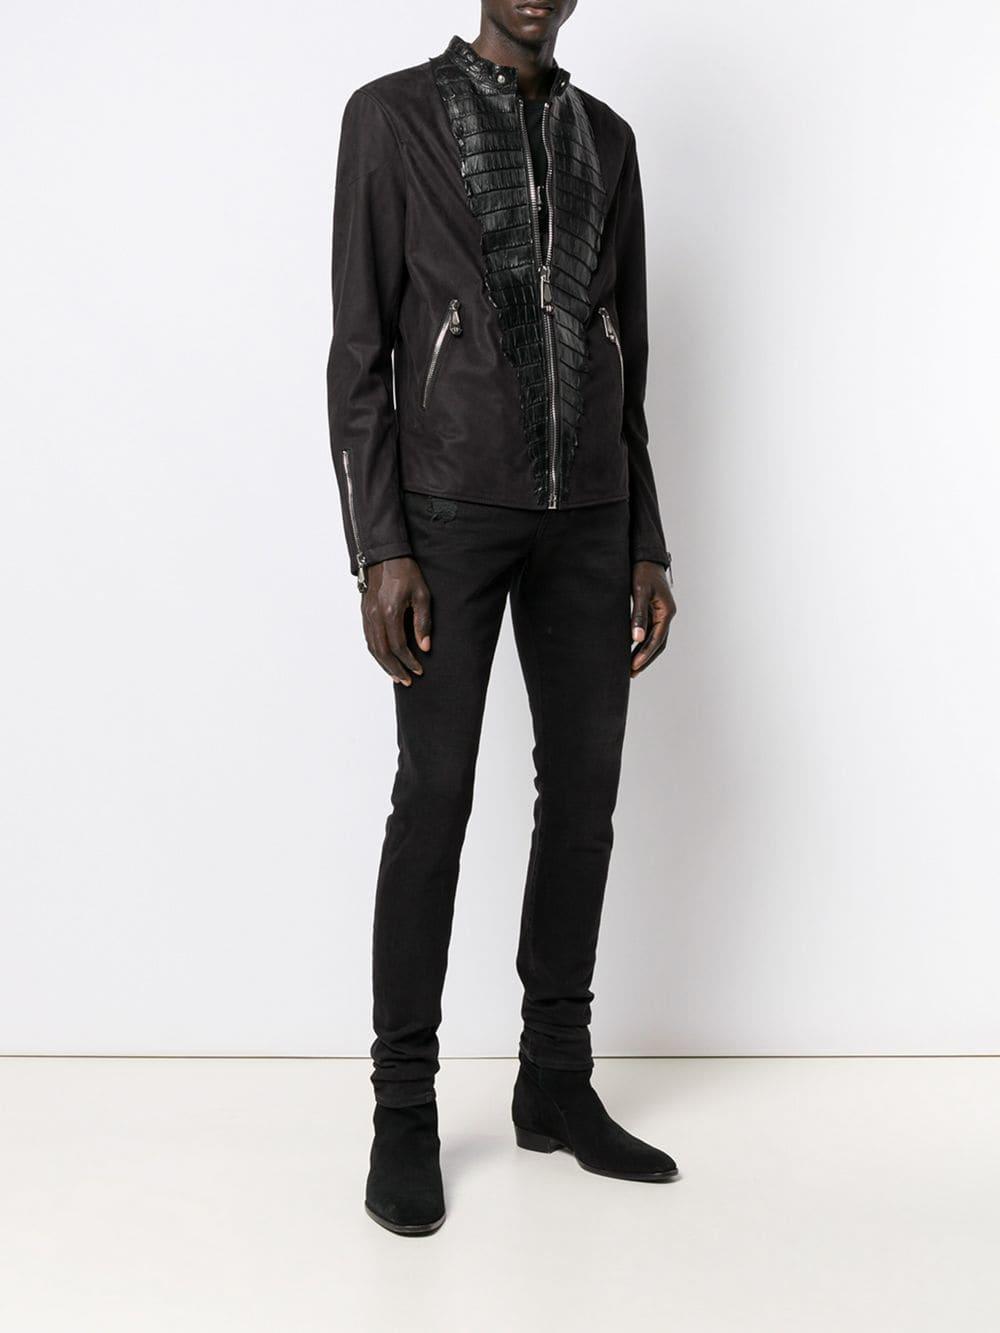 ffc399b6b9 Lyst - Philipp Plein Luxury Motorcycle Jacket in Black for Men